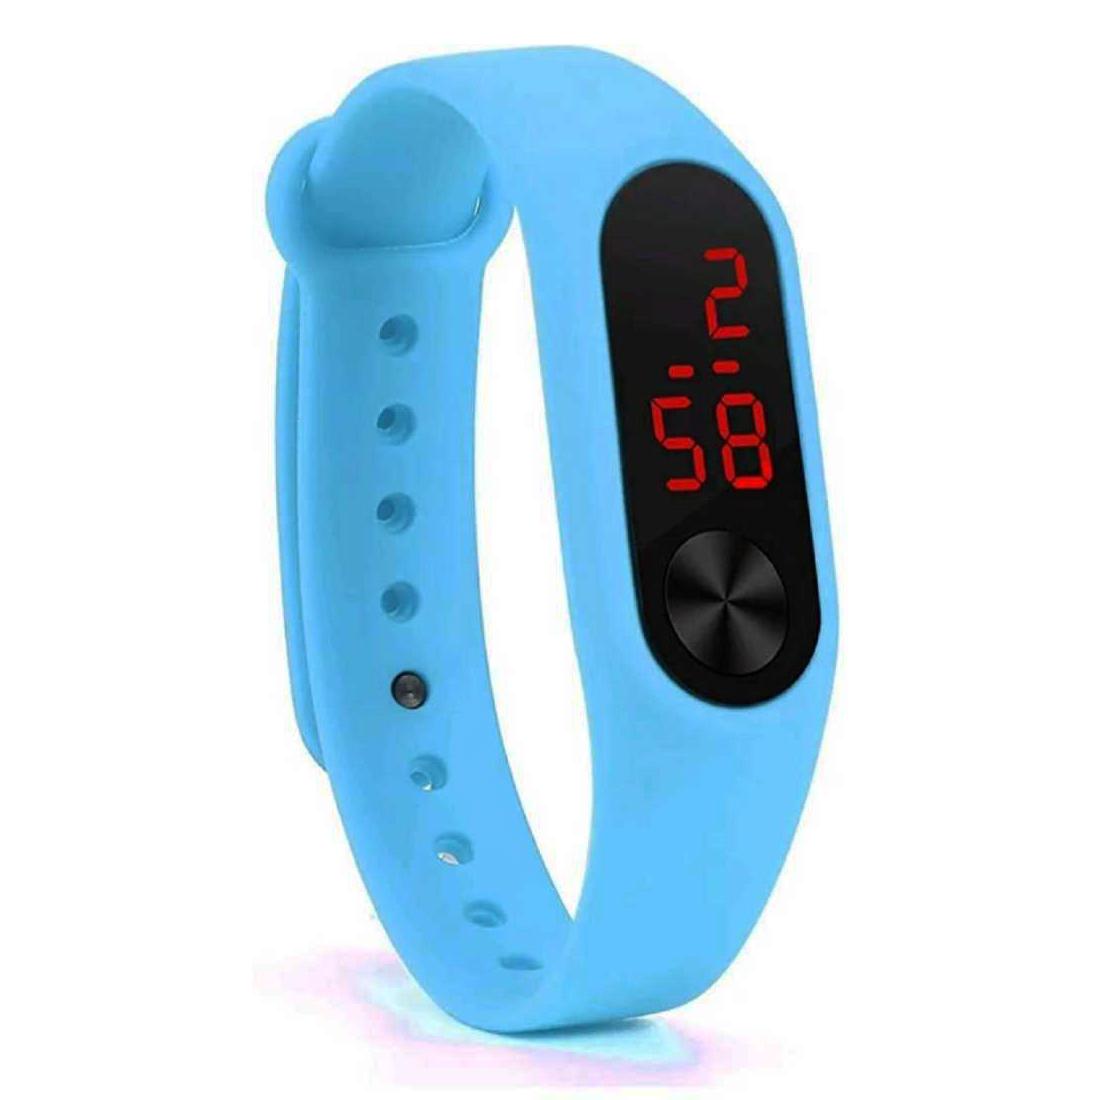 Varni Retail Rubber Magnet New LedSky Blue Digital Watch M2 LED RED   For Boys Girls